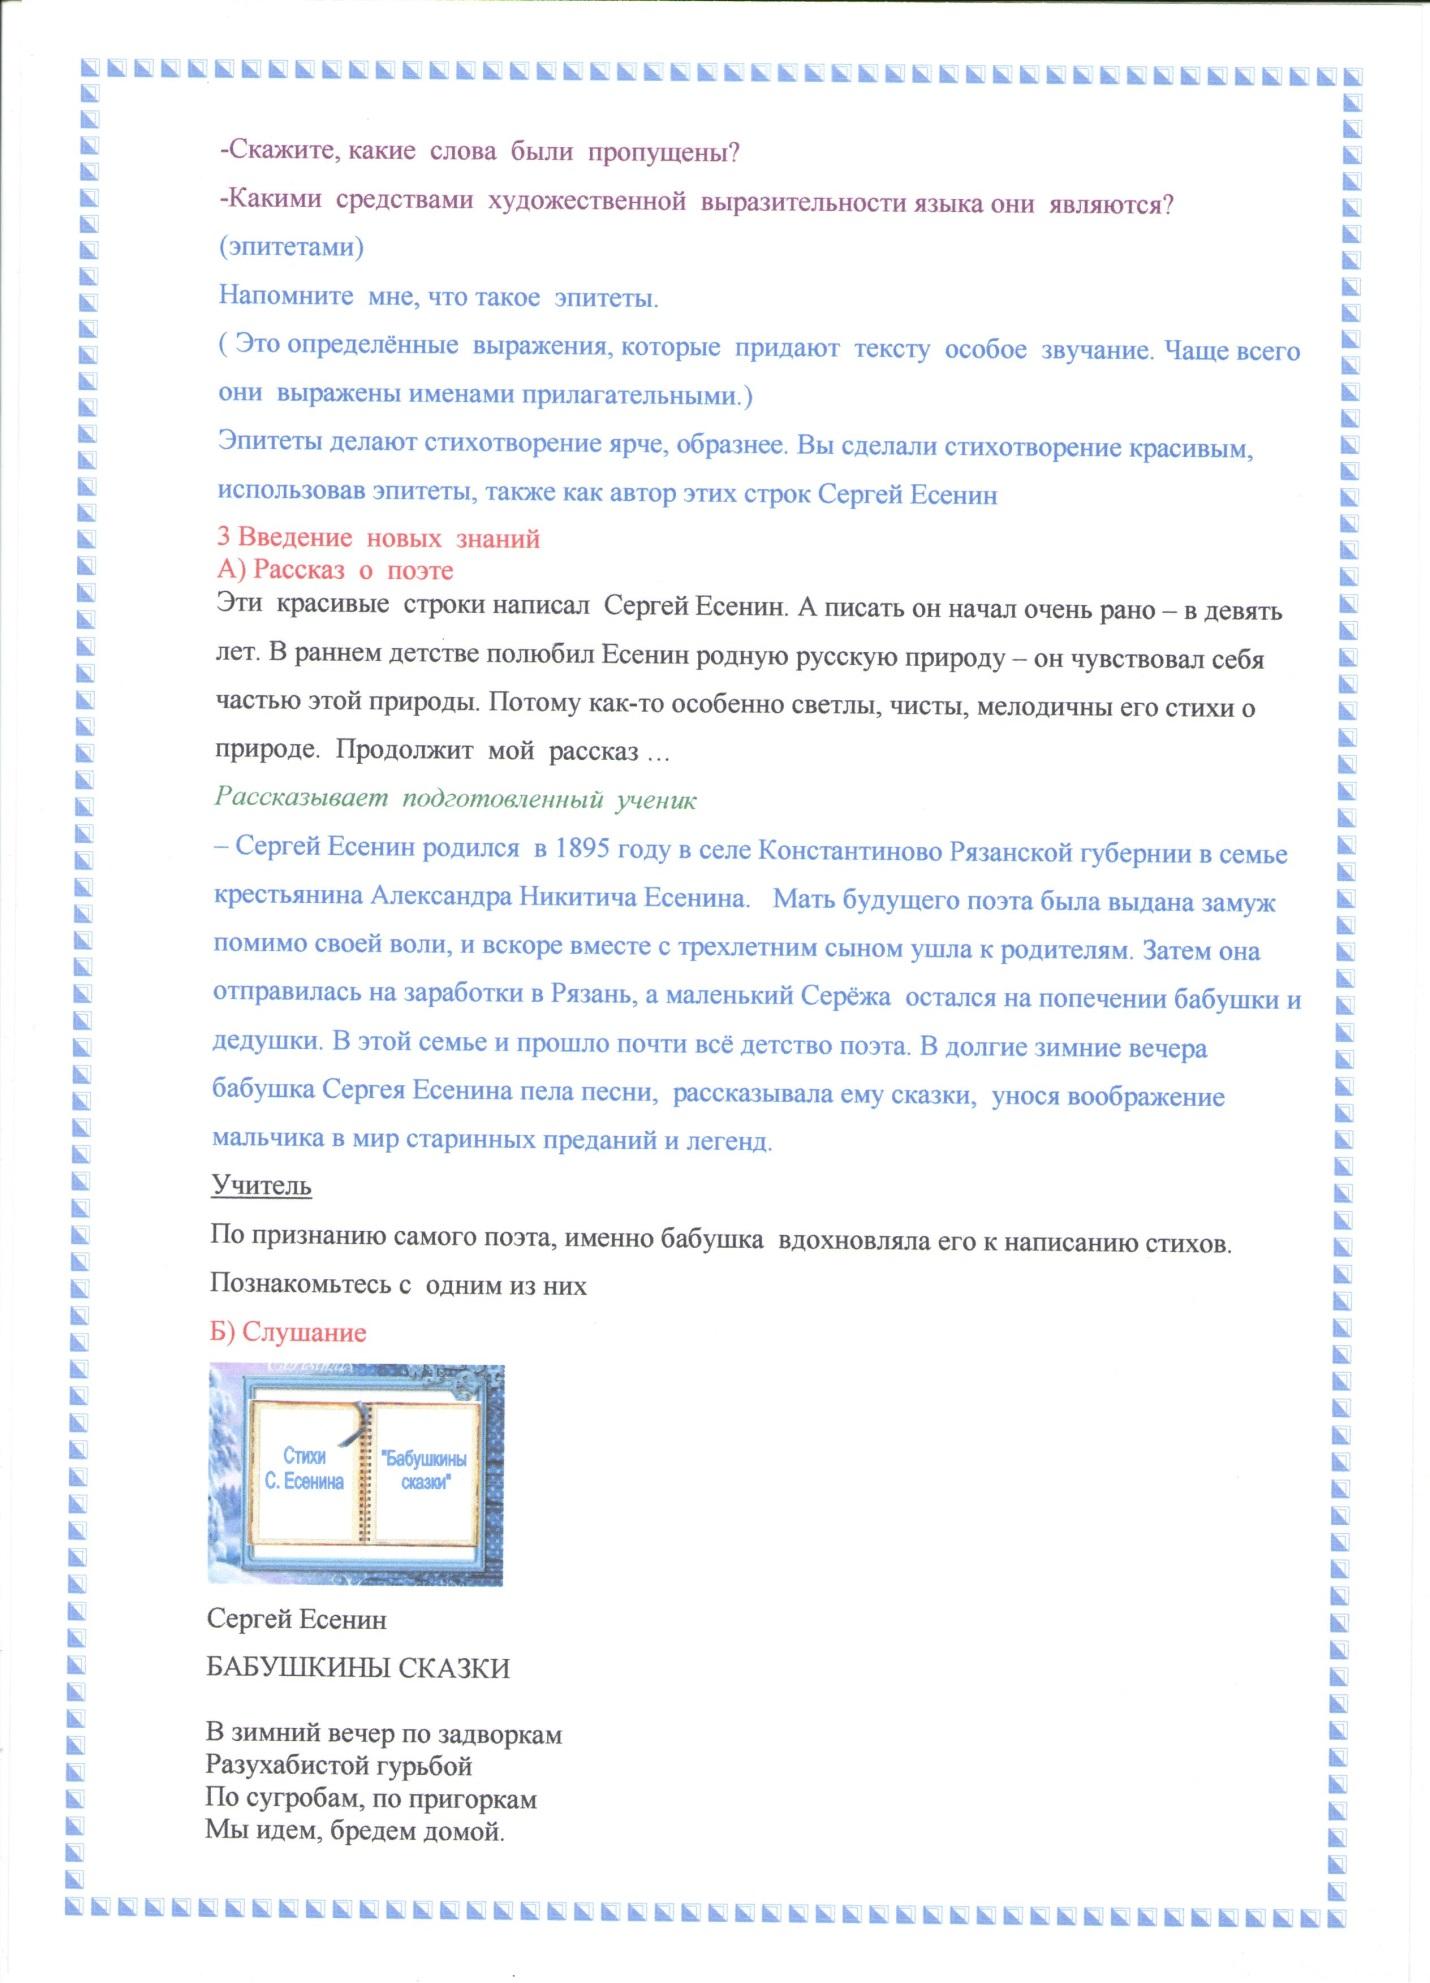 C:\Users\User\Desktop\3Б\2015-10-16 5\5 001.jpg